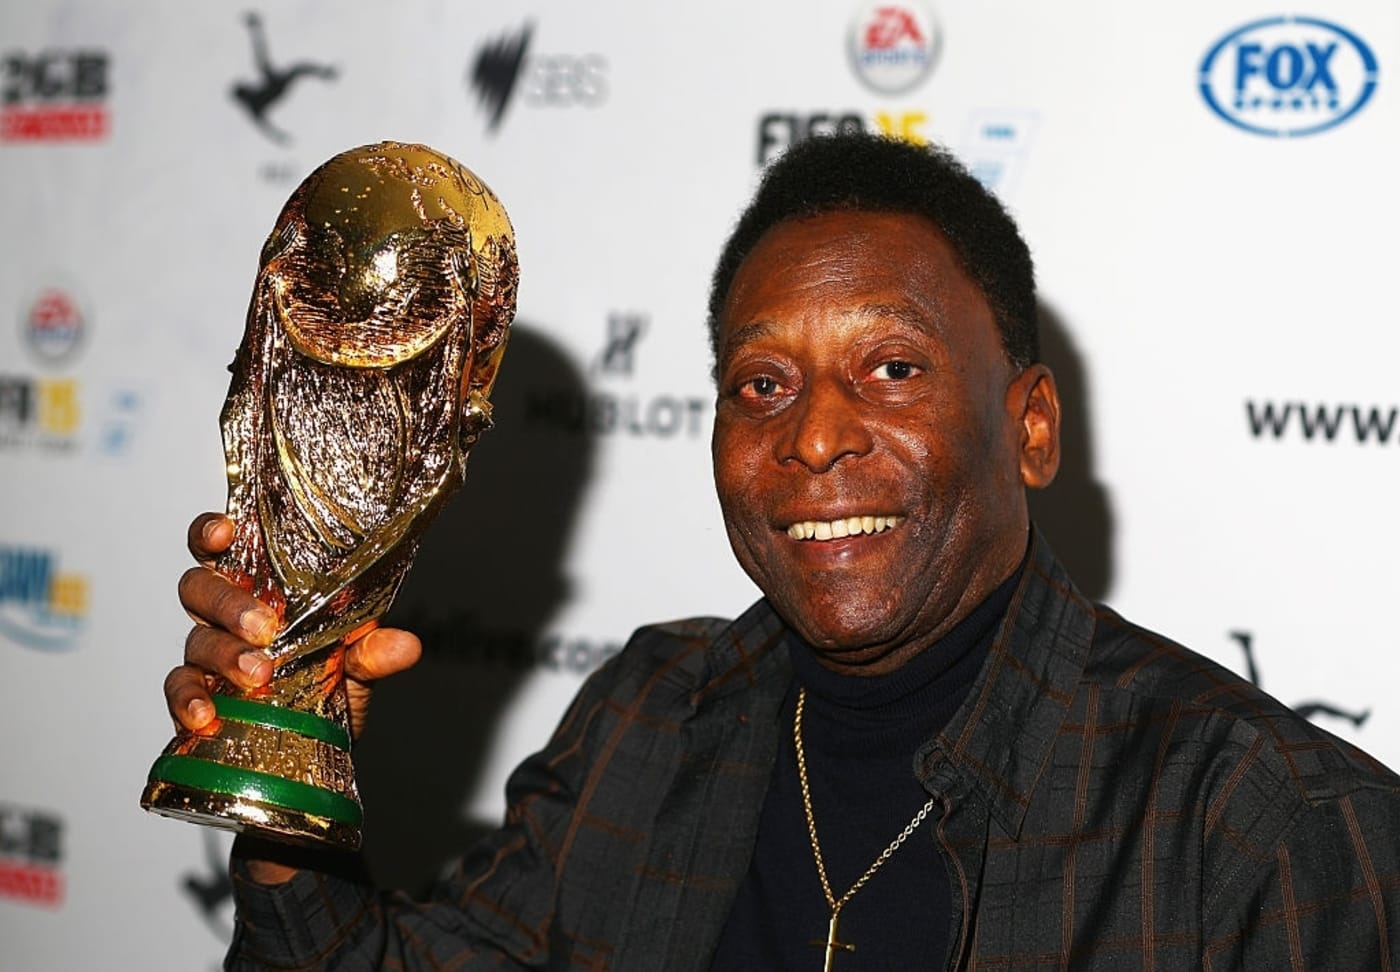 Pelé (credit: Robert Cianflone / Getty Images)